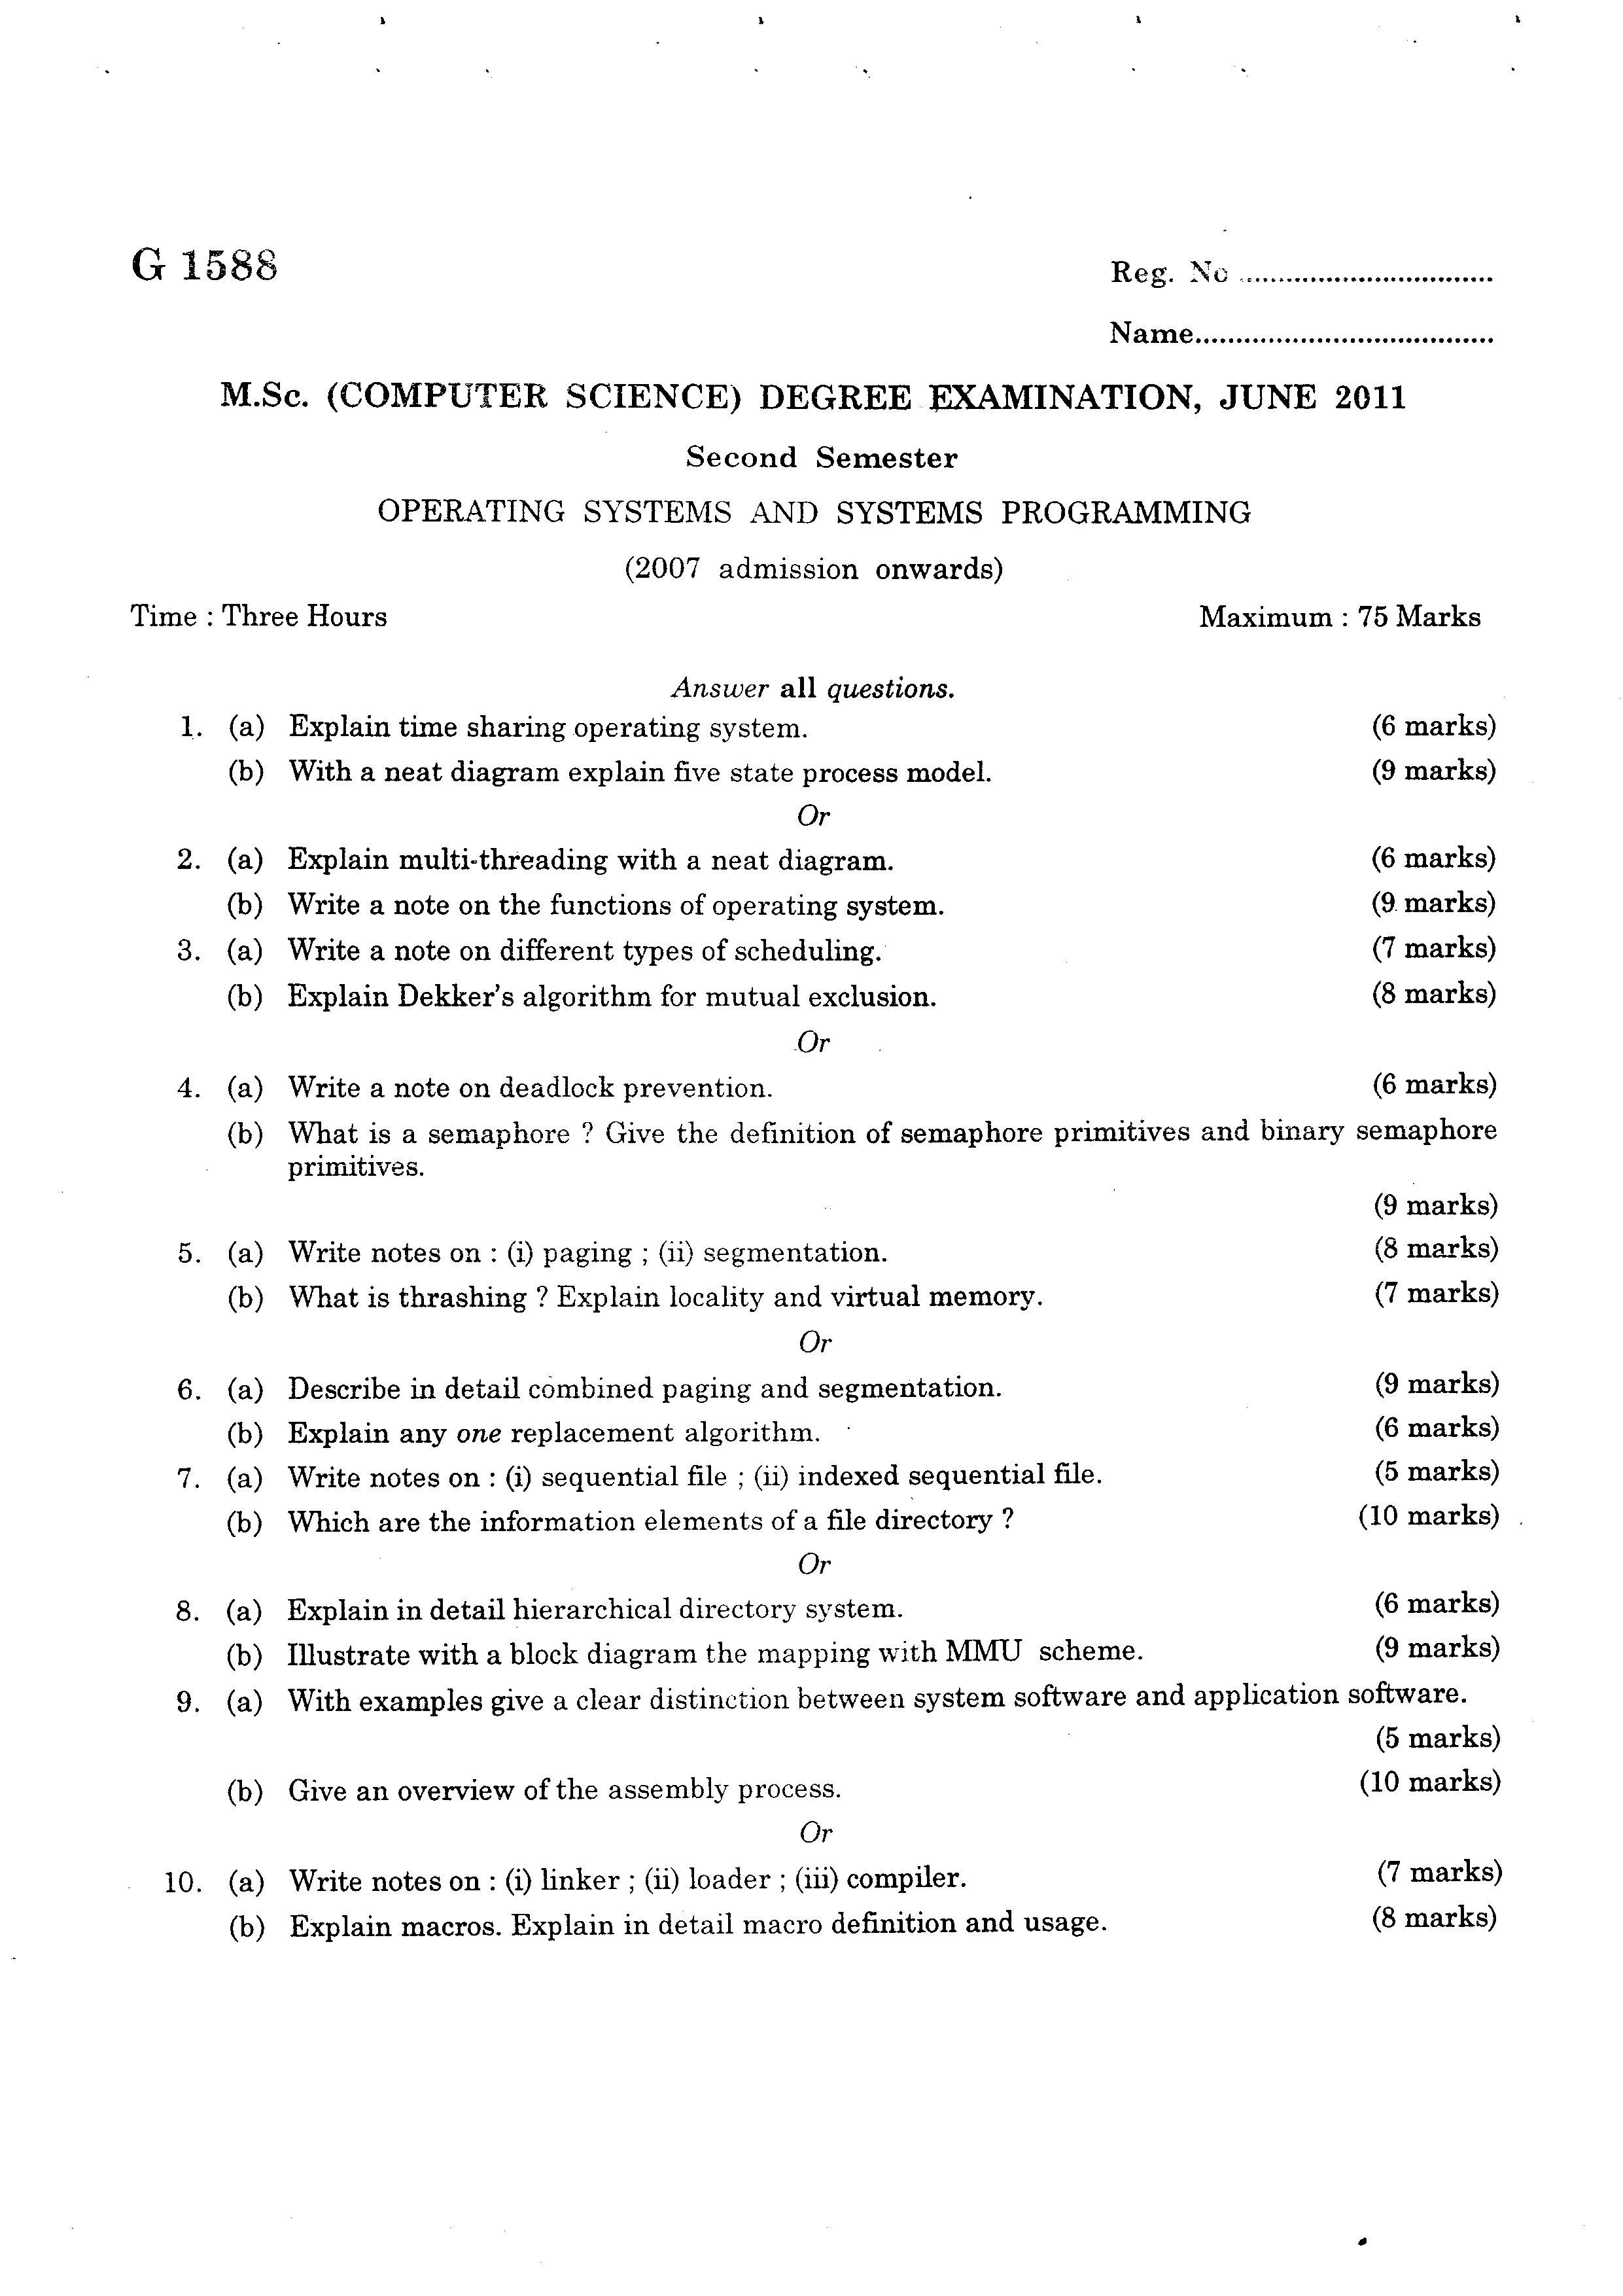 Mahatma Gandhi University Second Semester Computer Science